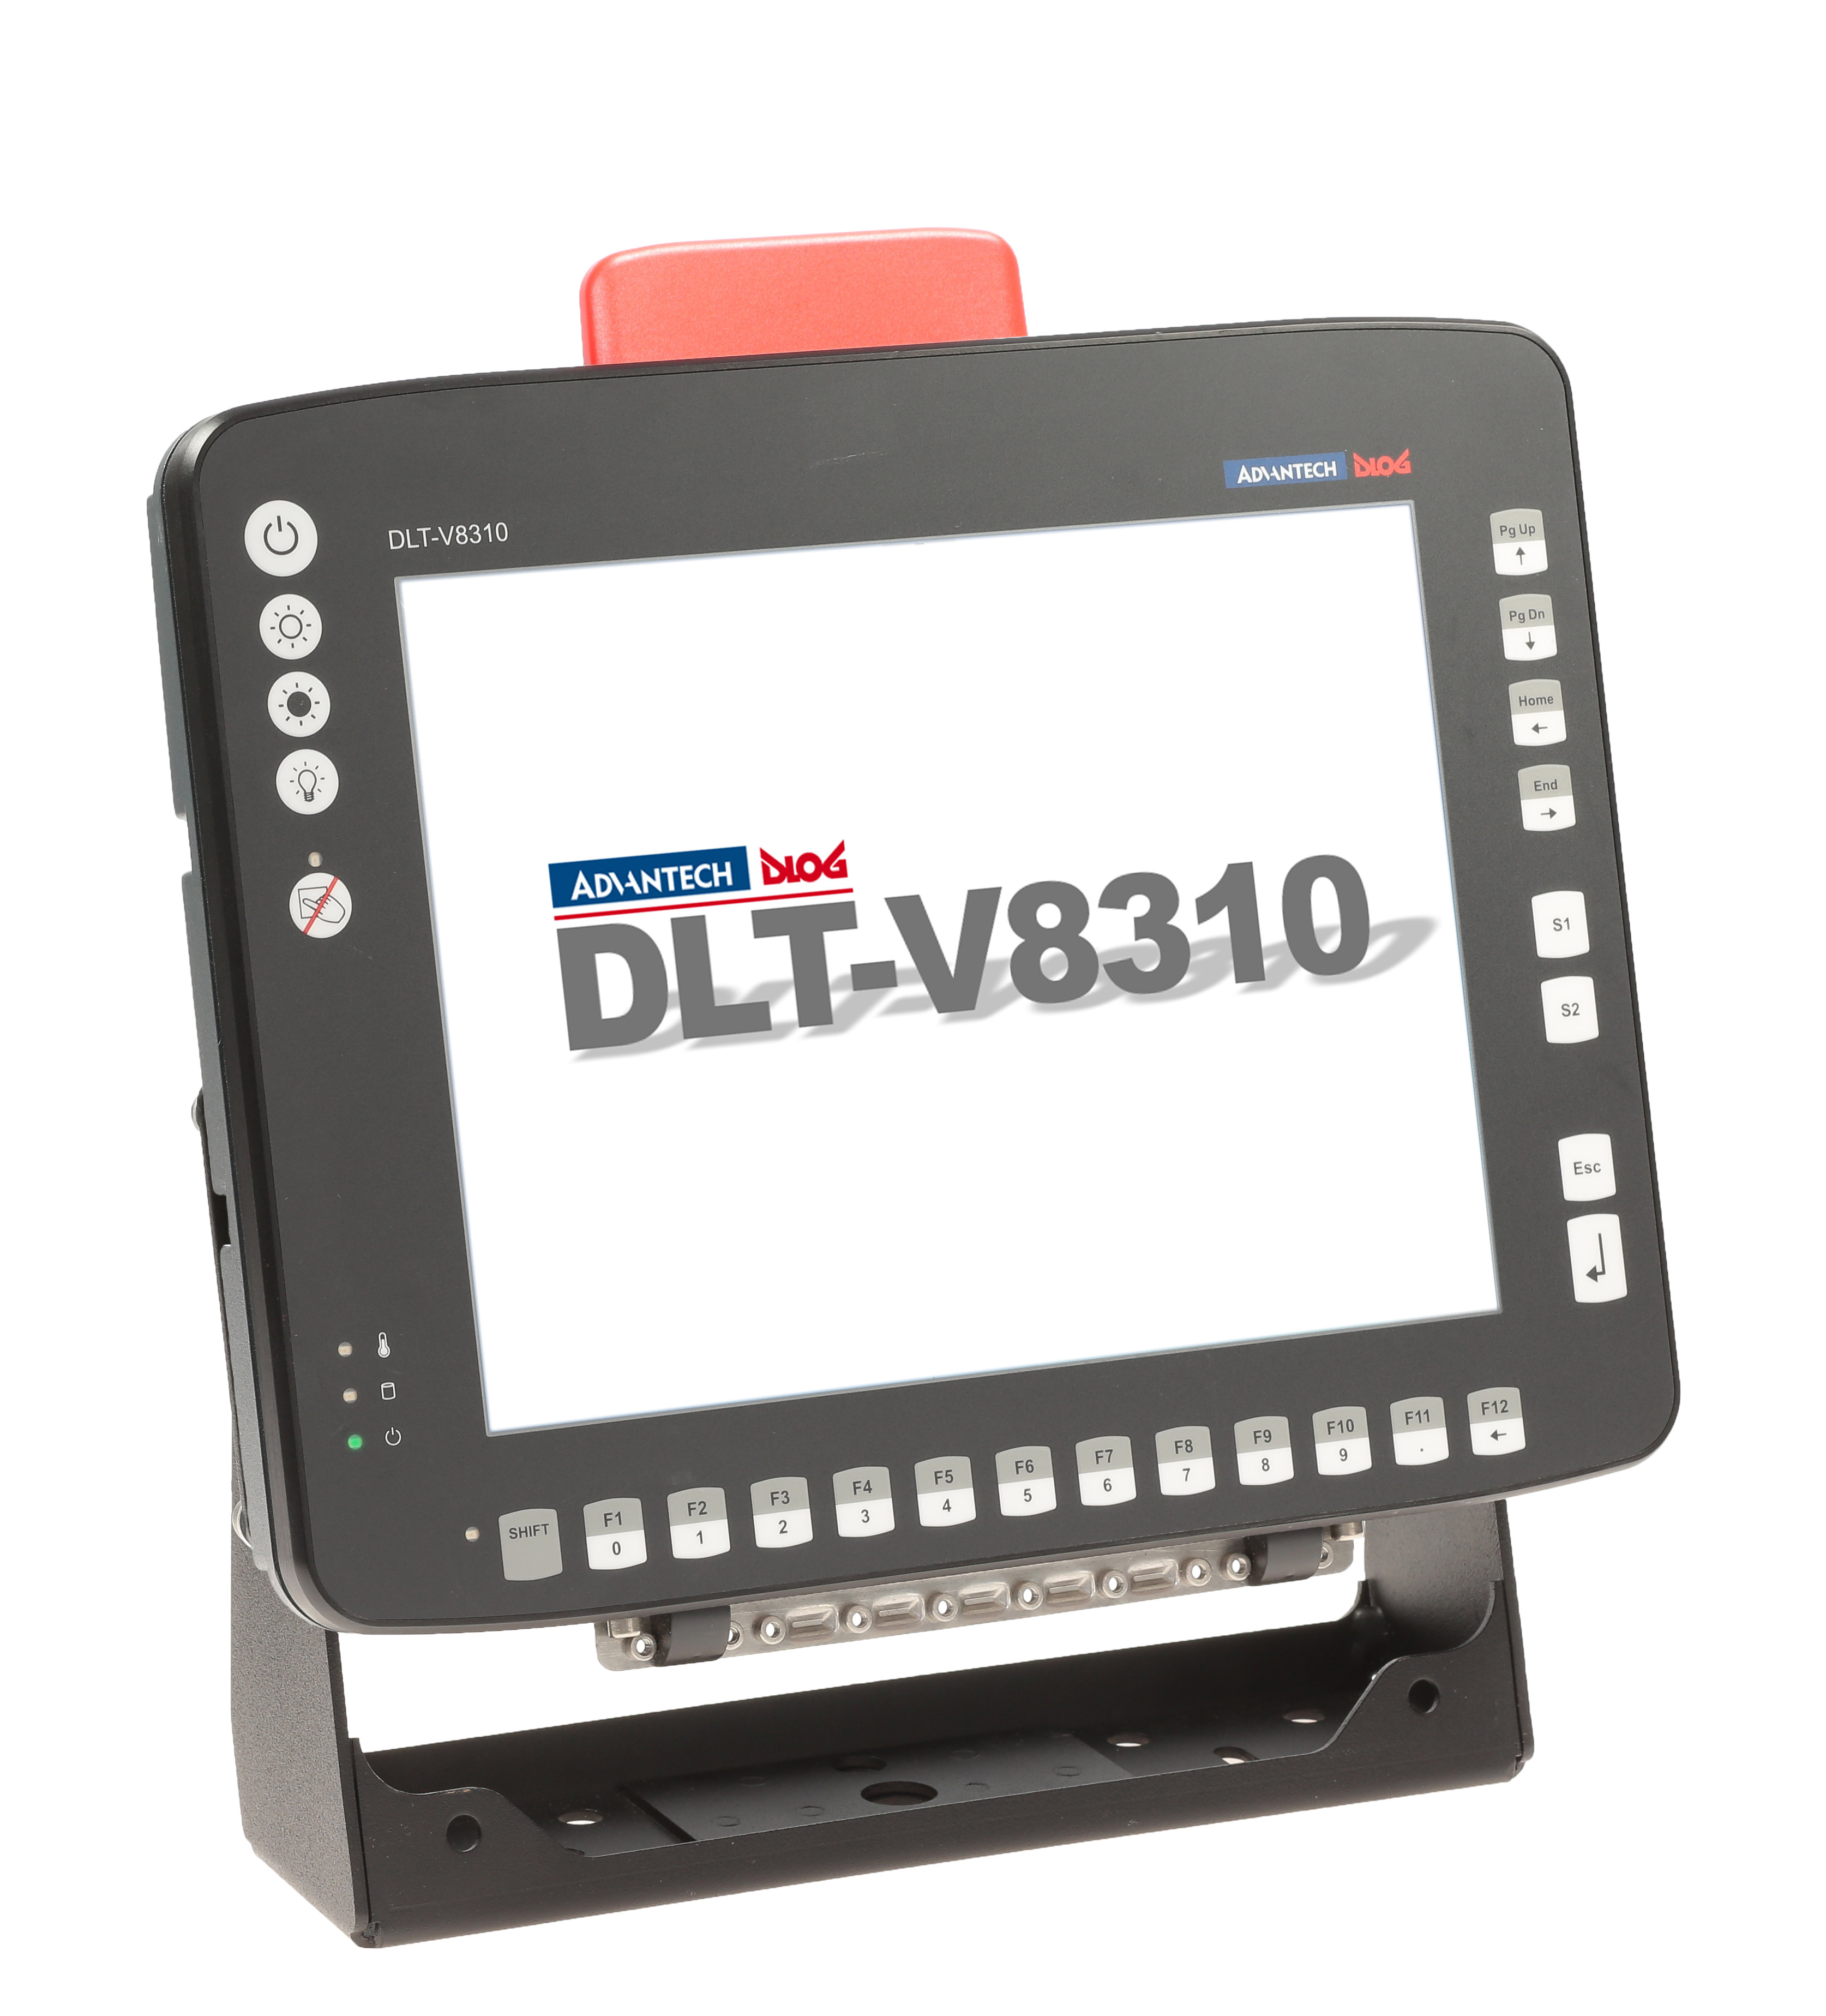 Staplerterminal von Advantech DLoG DLT-V83